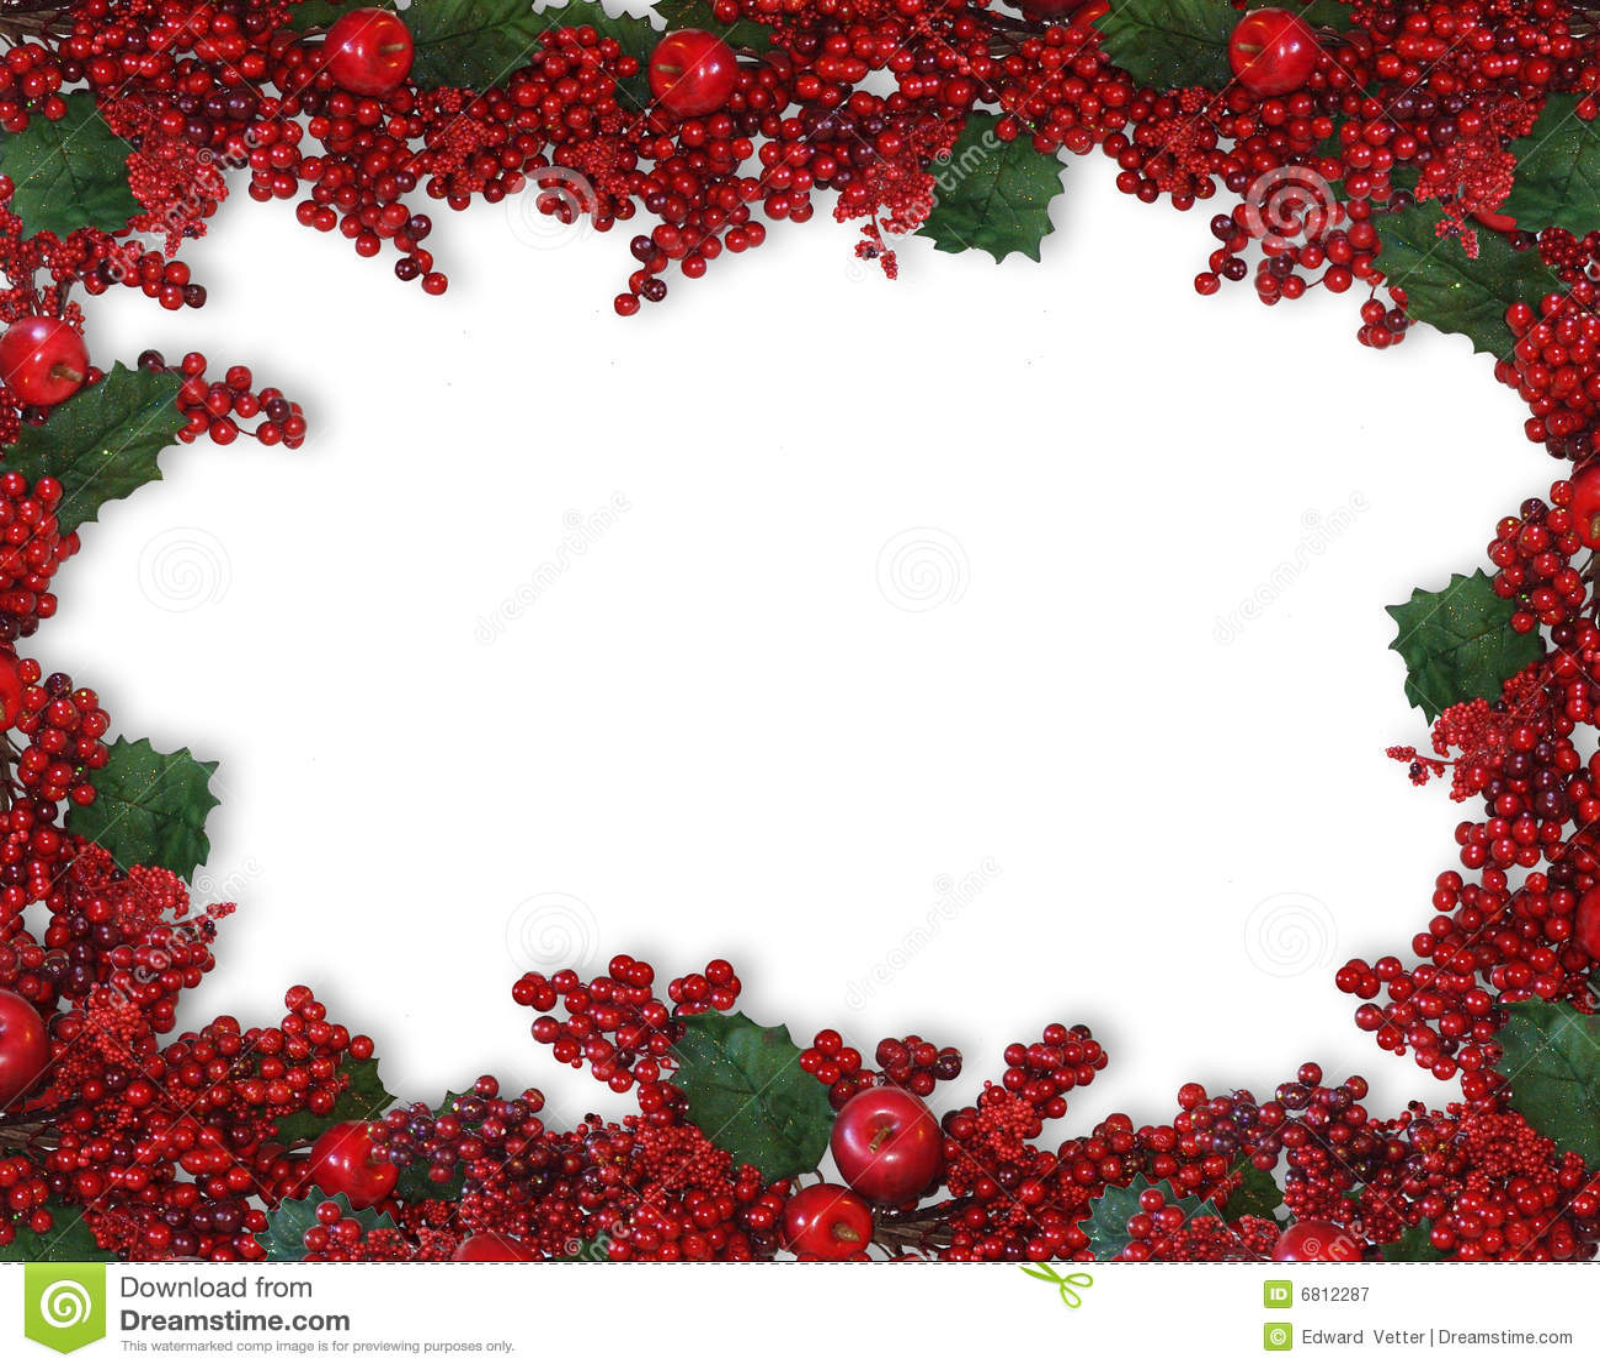 Christmas holly berries border stock illustration